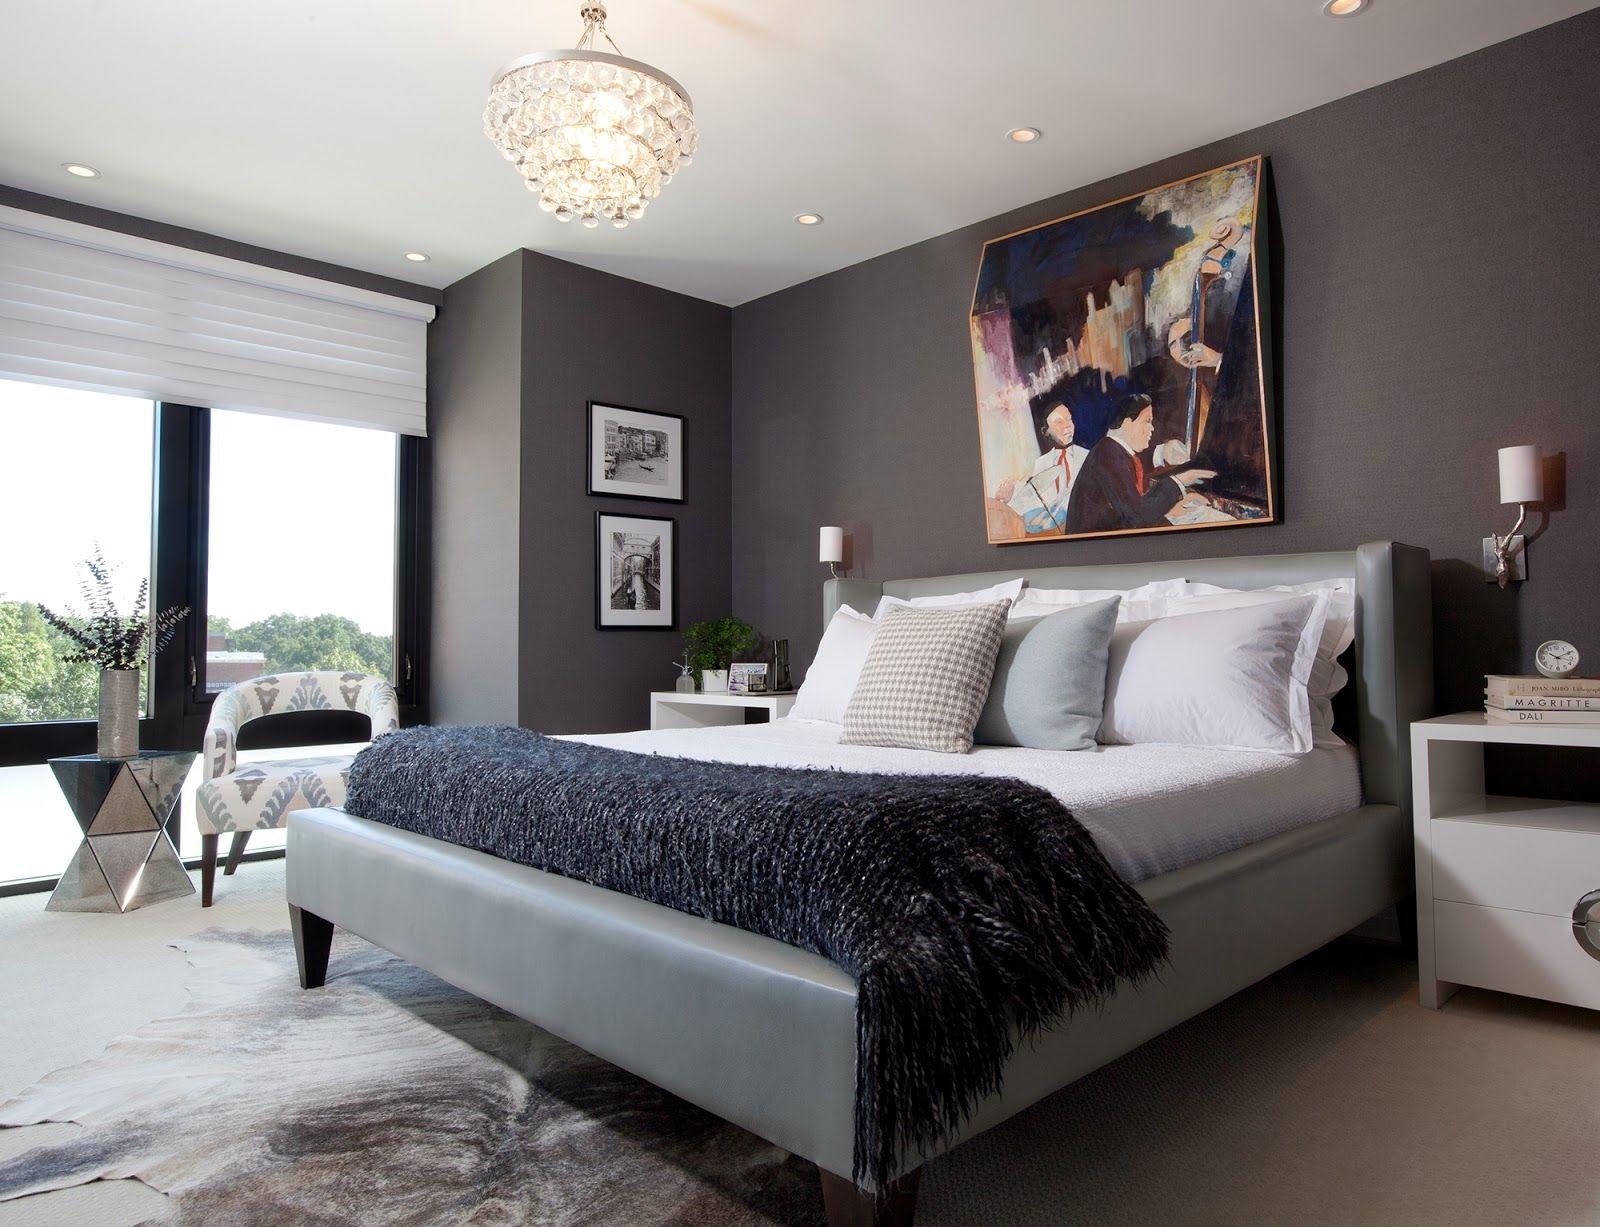 Man bedrooms ideas  Home Idea in 2019  Chandelier